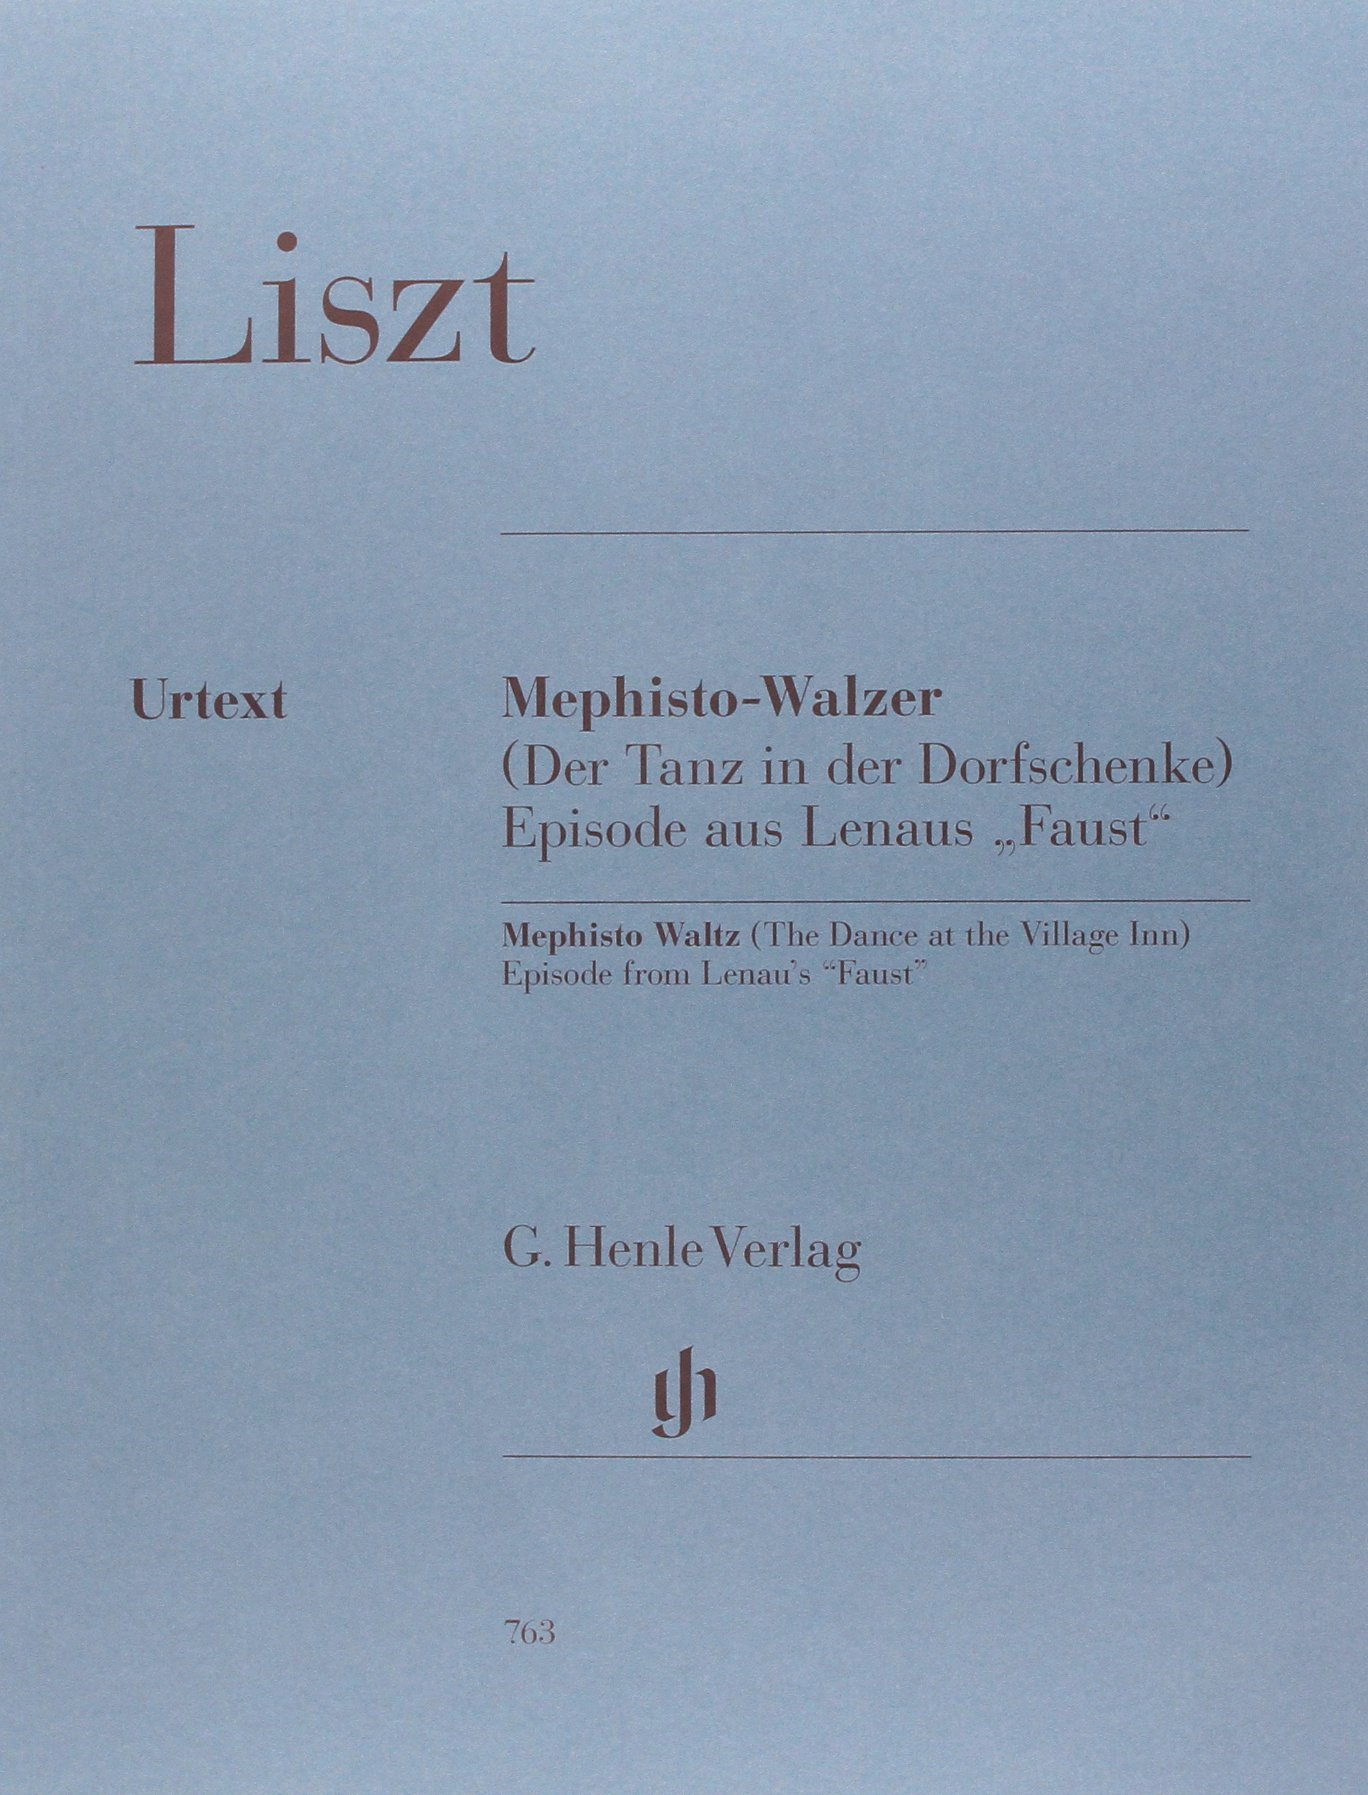 Liszt: Mephisto Waltz (The Dance at the Village Inn): Franz Liszt:  9790201807638: Amazon.com: Books